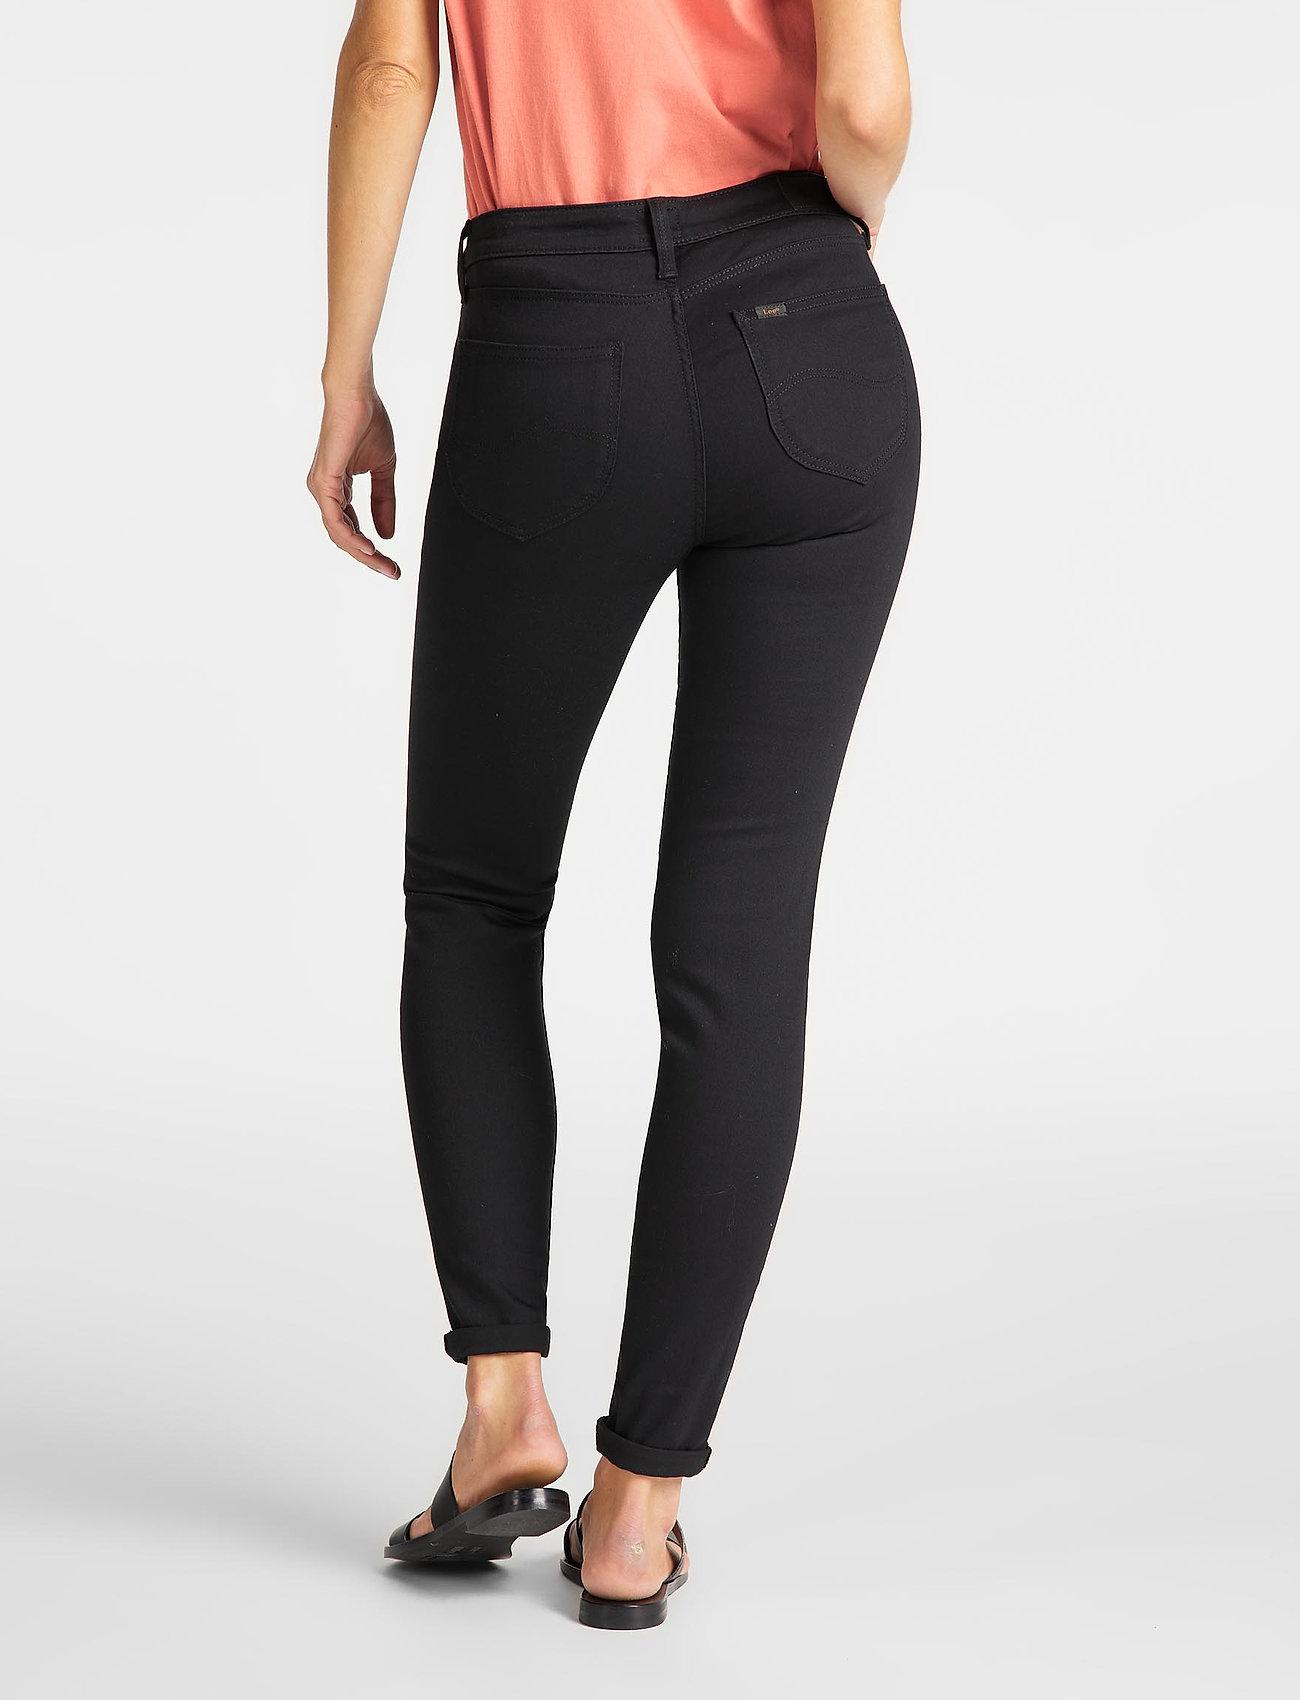 Lee Jeans - SCARLETT - skinny jeans - black rinse - 3